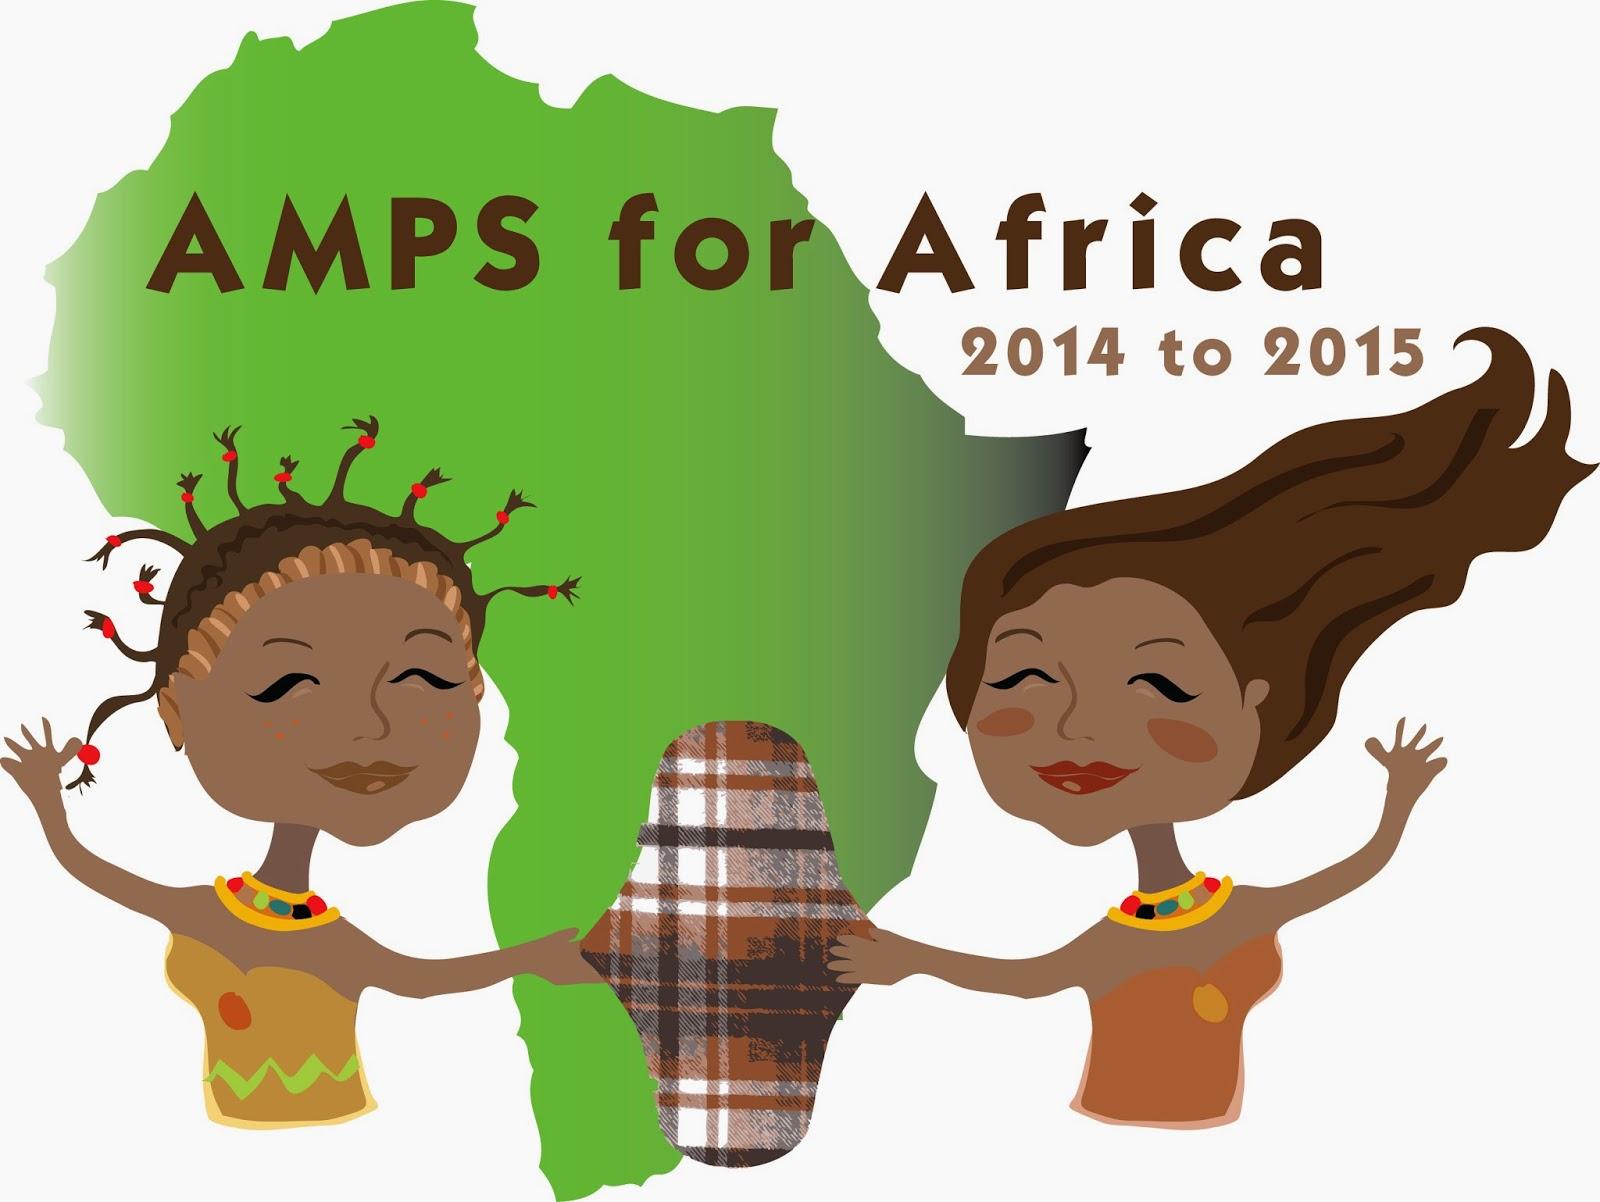 http://emilla.hu/spg/738288/Adomanyozzunk-betetet-Afrikaba